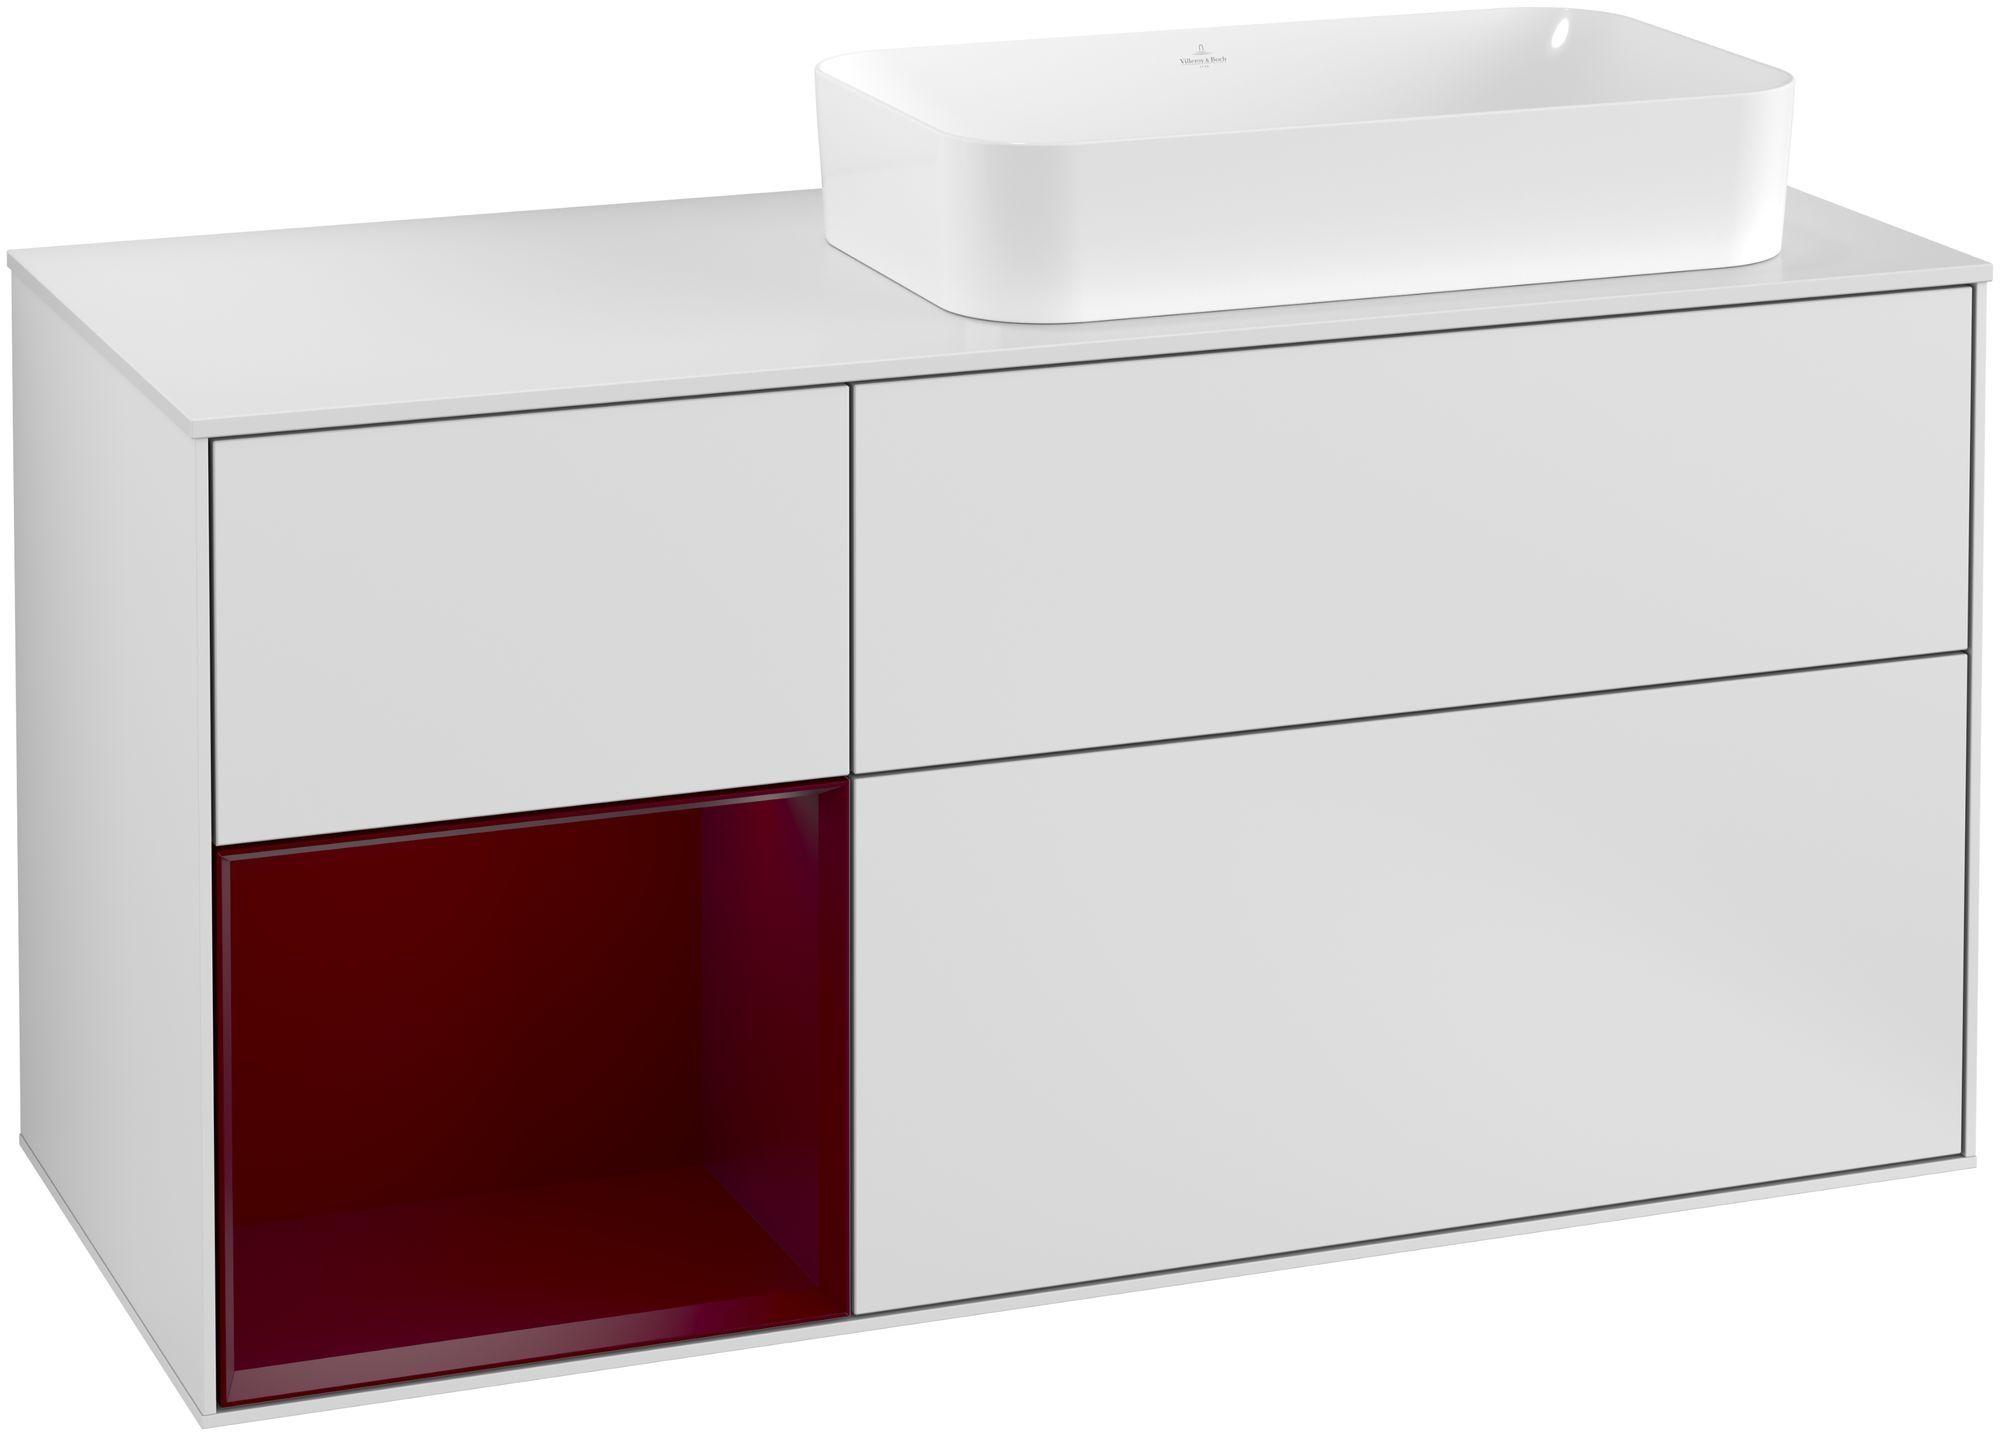 Villeroy & Boch Finion F27 Waschtischunterschrank mit Regalelement 3 Auszüge Waschtisch rechts LED-Beleuchtung B:120xH:60,3xT:50,1cm Front, Korpus: Weiß Matt Soft Grey, Regal: Peony, Glasplatte: White Matt F271HBMT